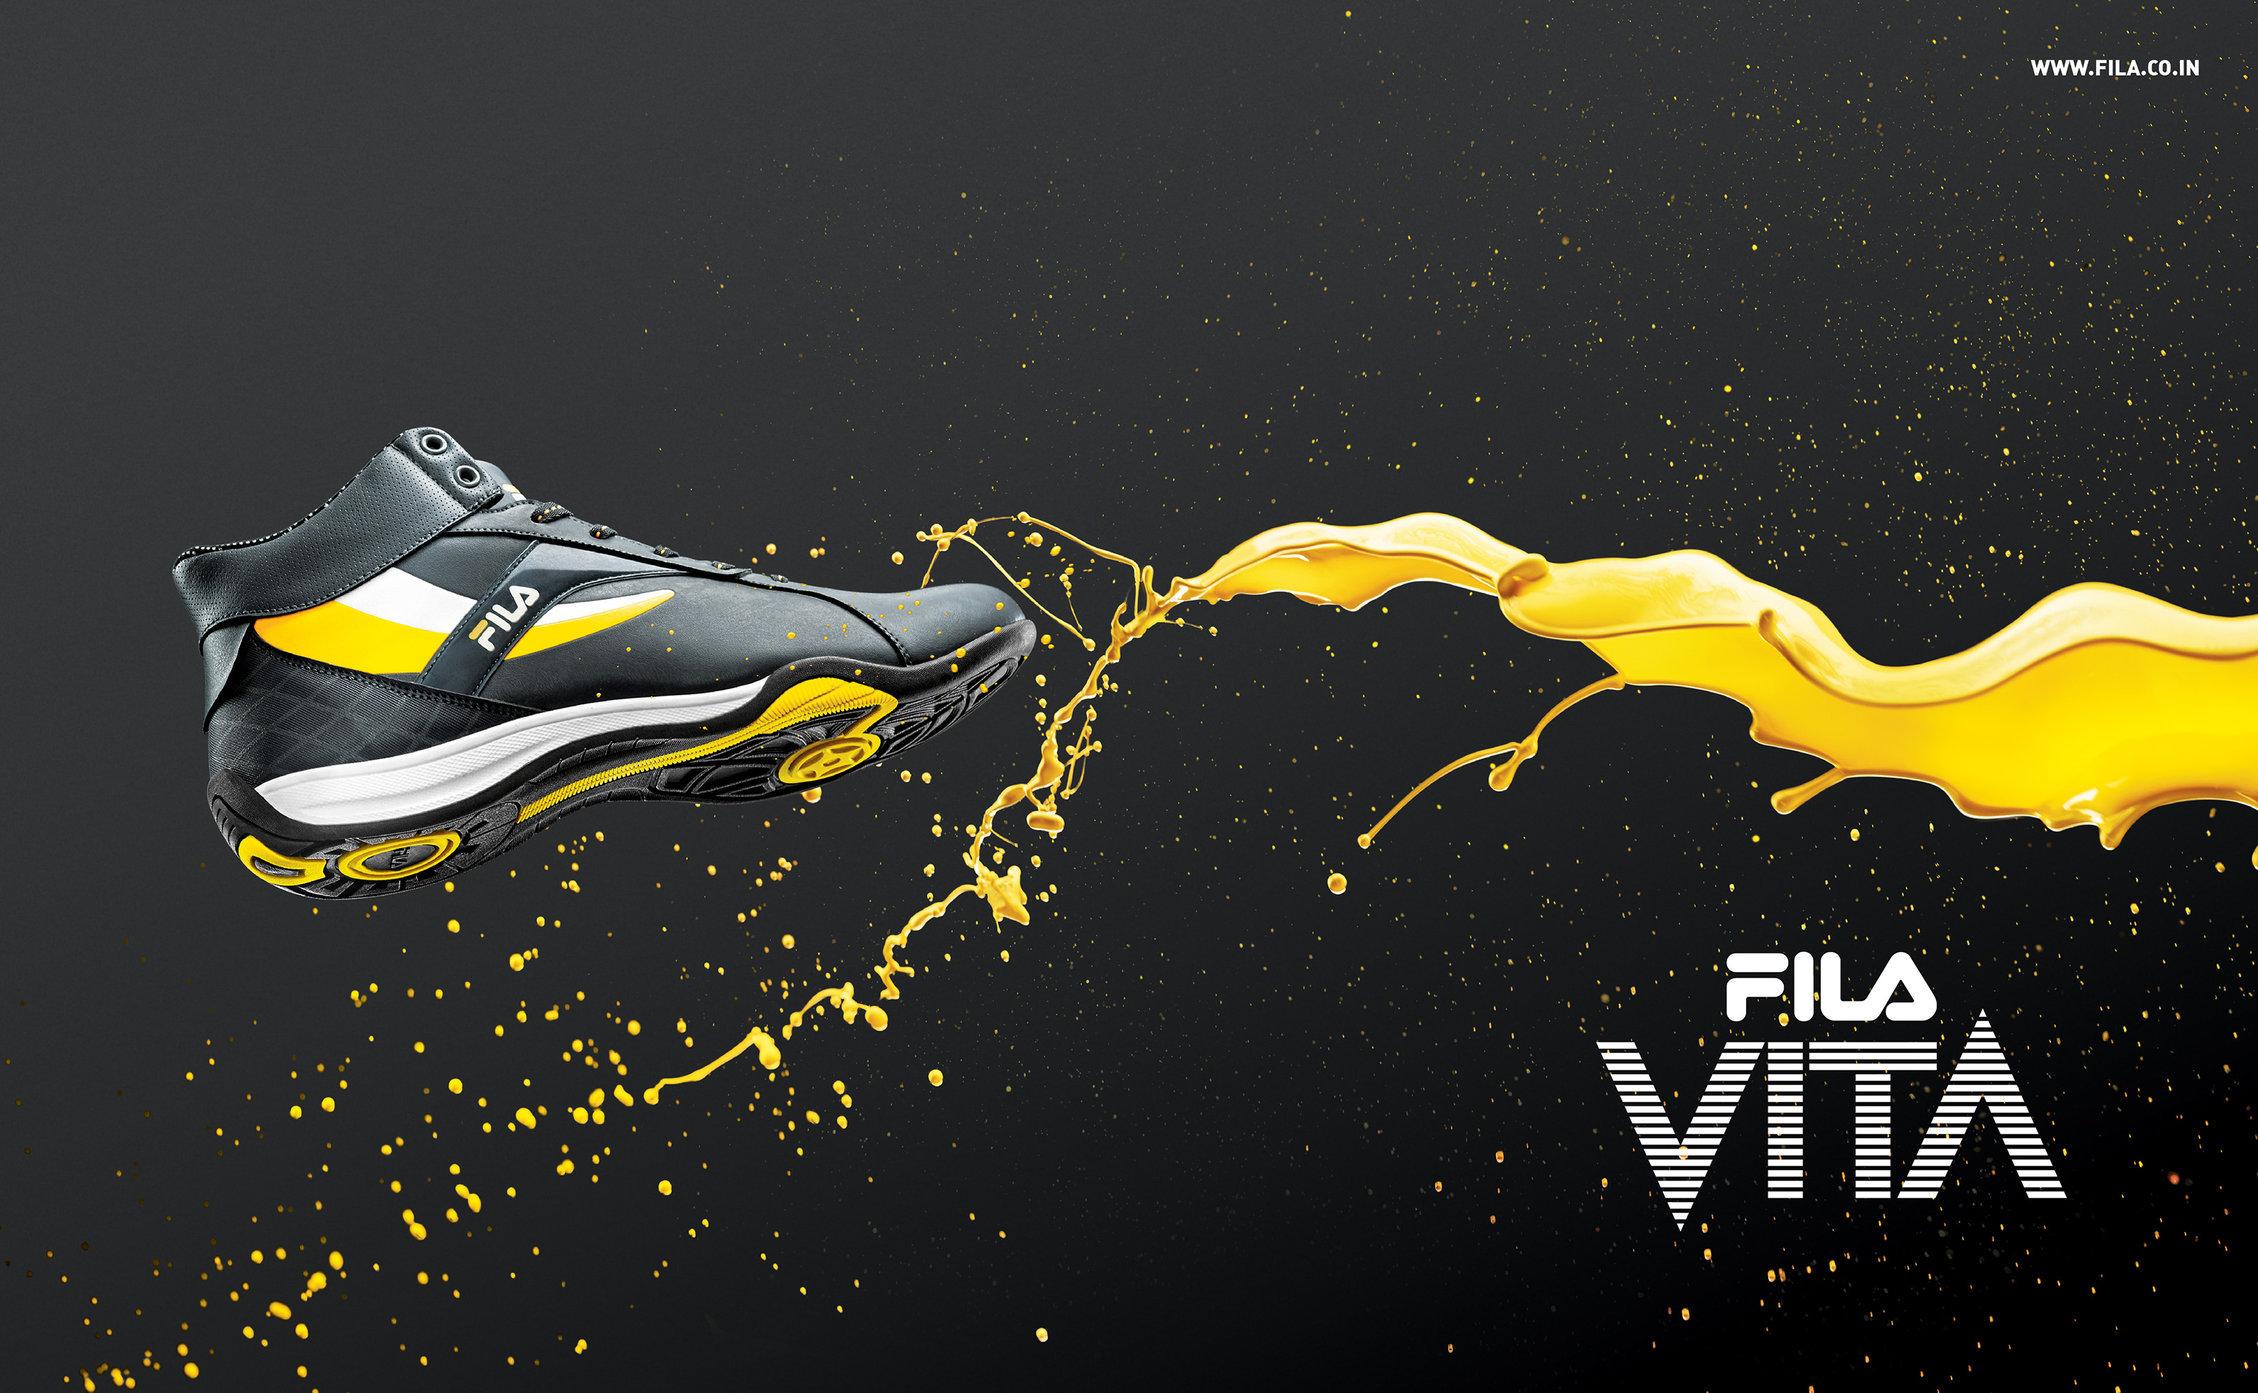 Fila SS17 Ad campaign 5.jpg